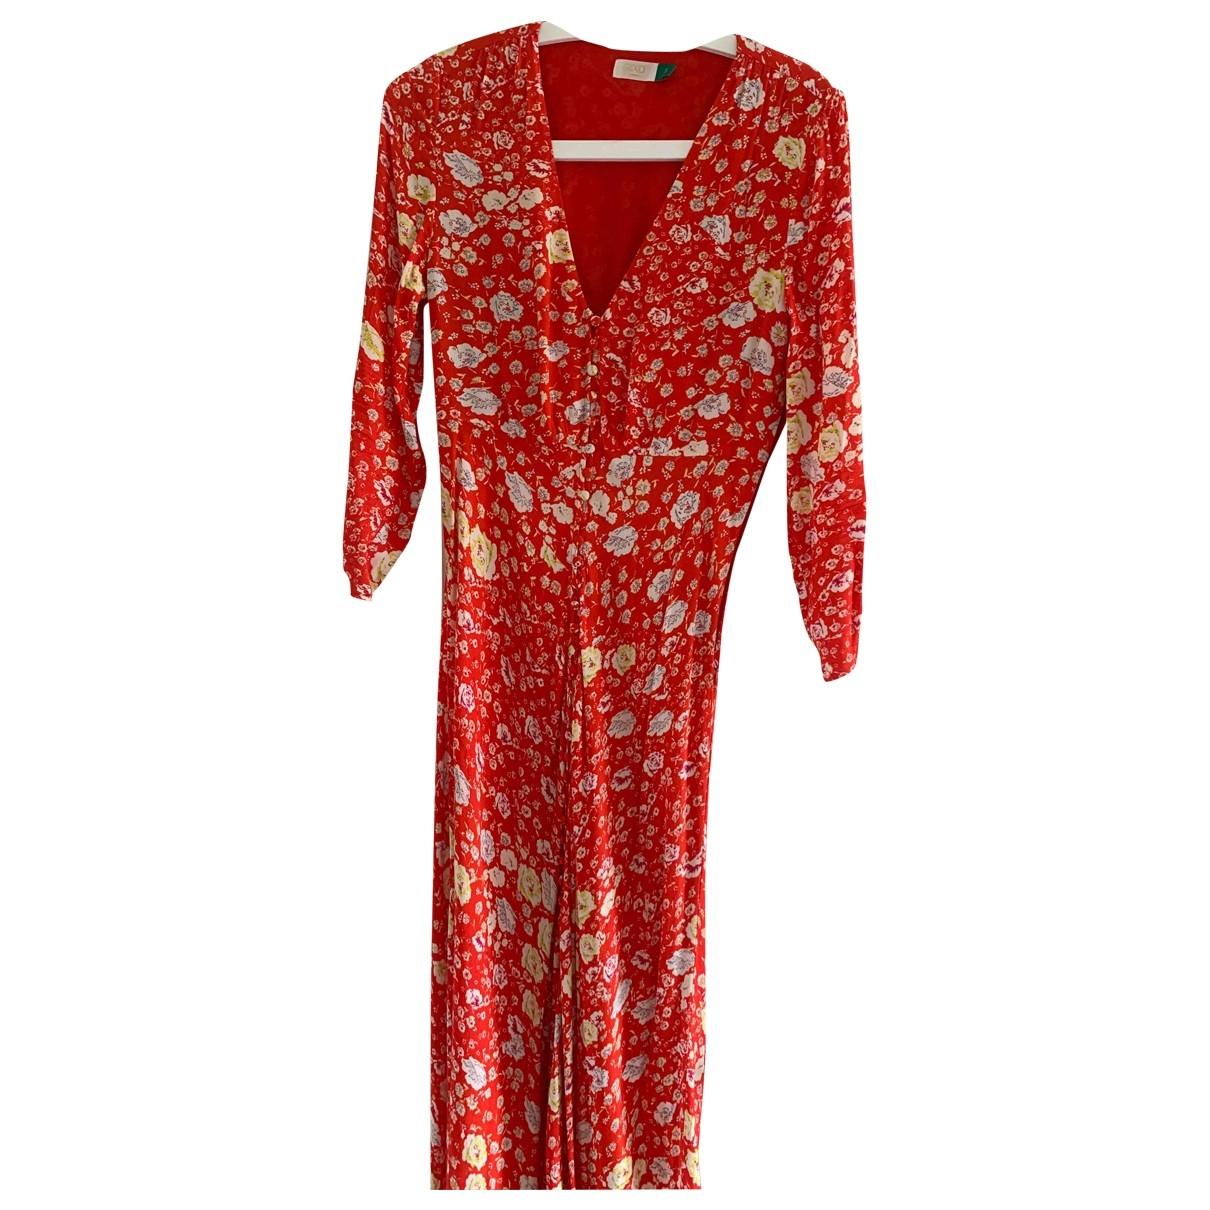 Rixo \N Red Cotton dress for Women 38 FR